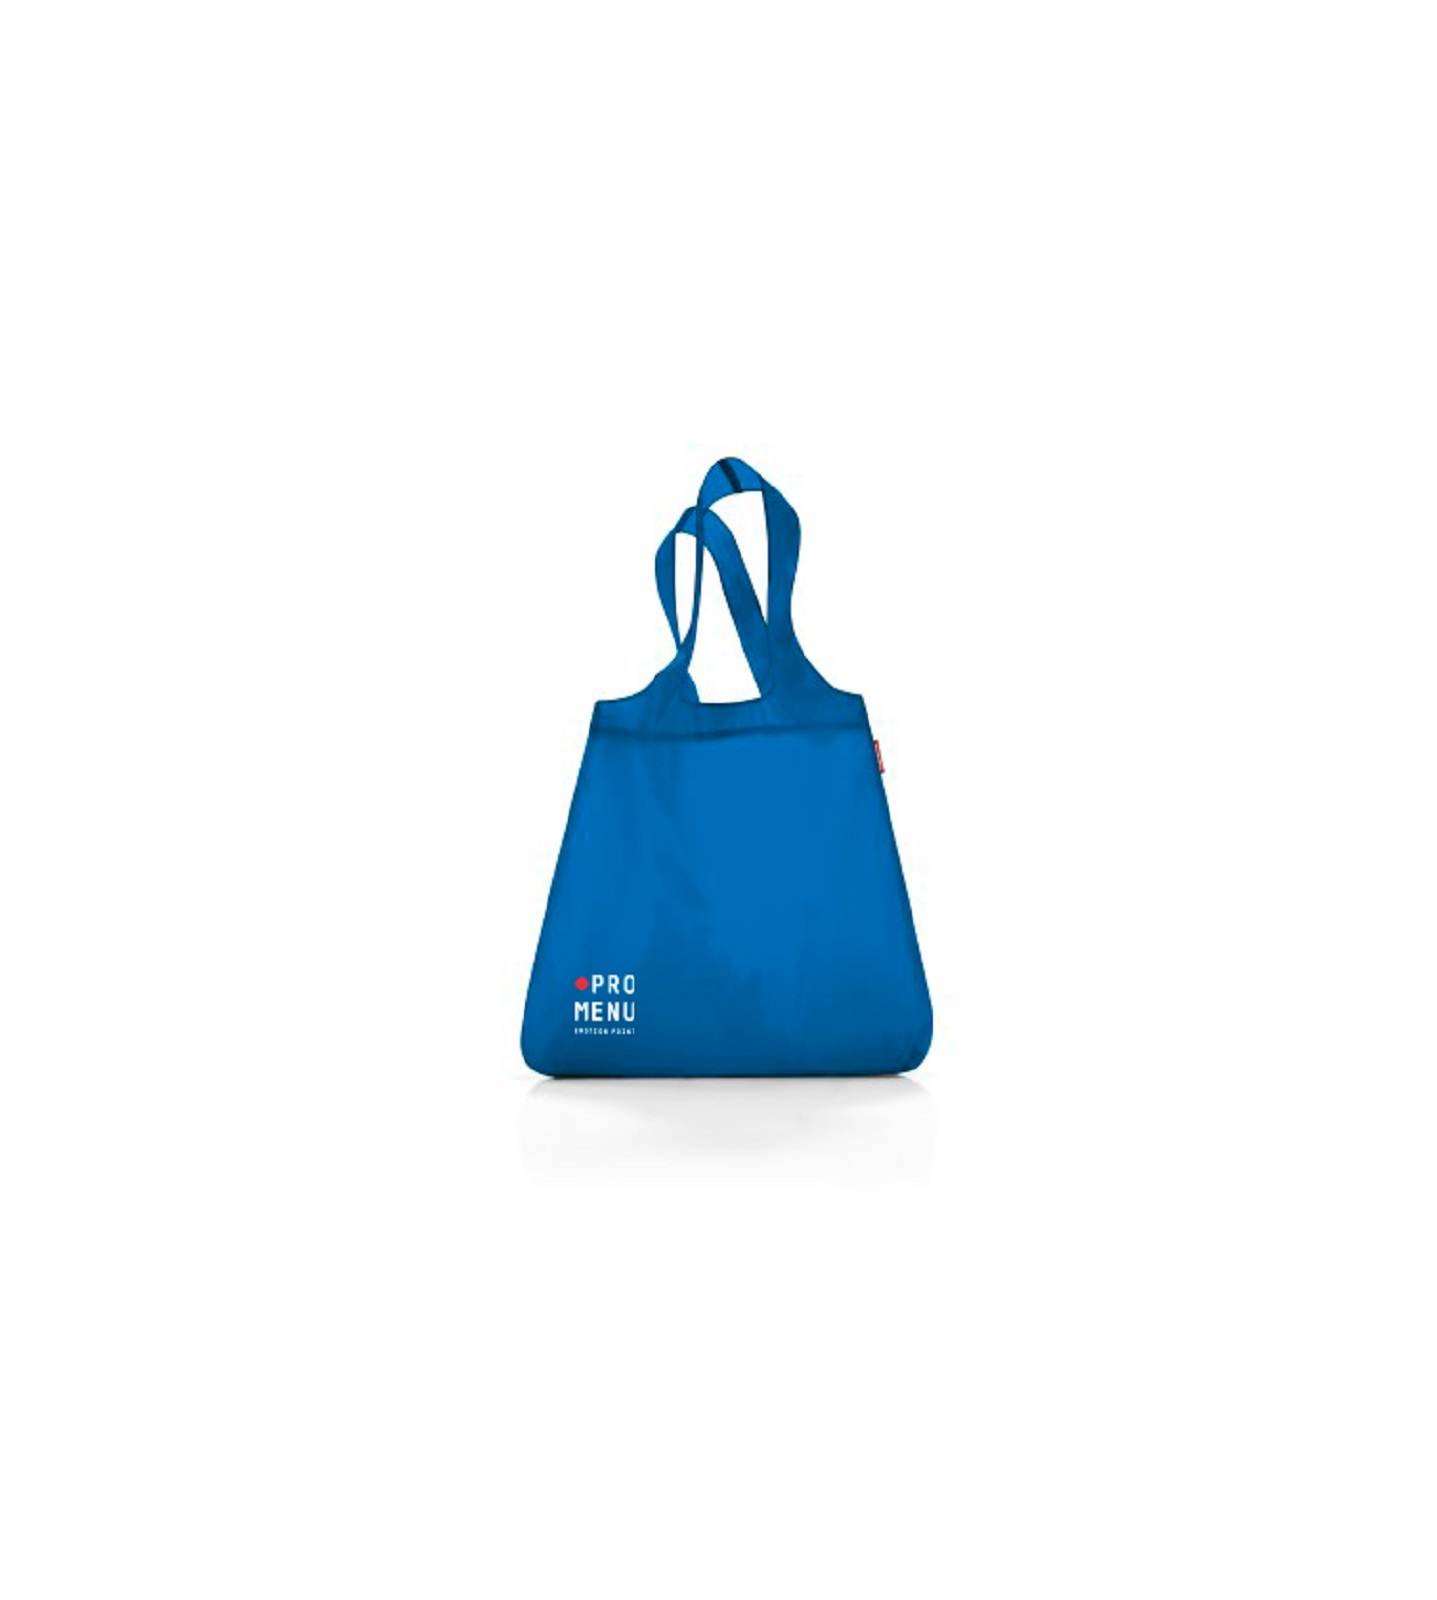 Сумка для шоппинга с лого Promenu Reisenthel Mini maxi shopper collection, 43,5 х 63 х 6 cм, цвет в ассортименте Reisenthel AT 0002LOGO фото 4